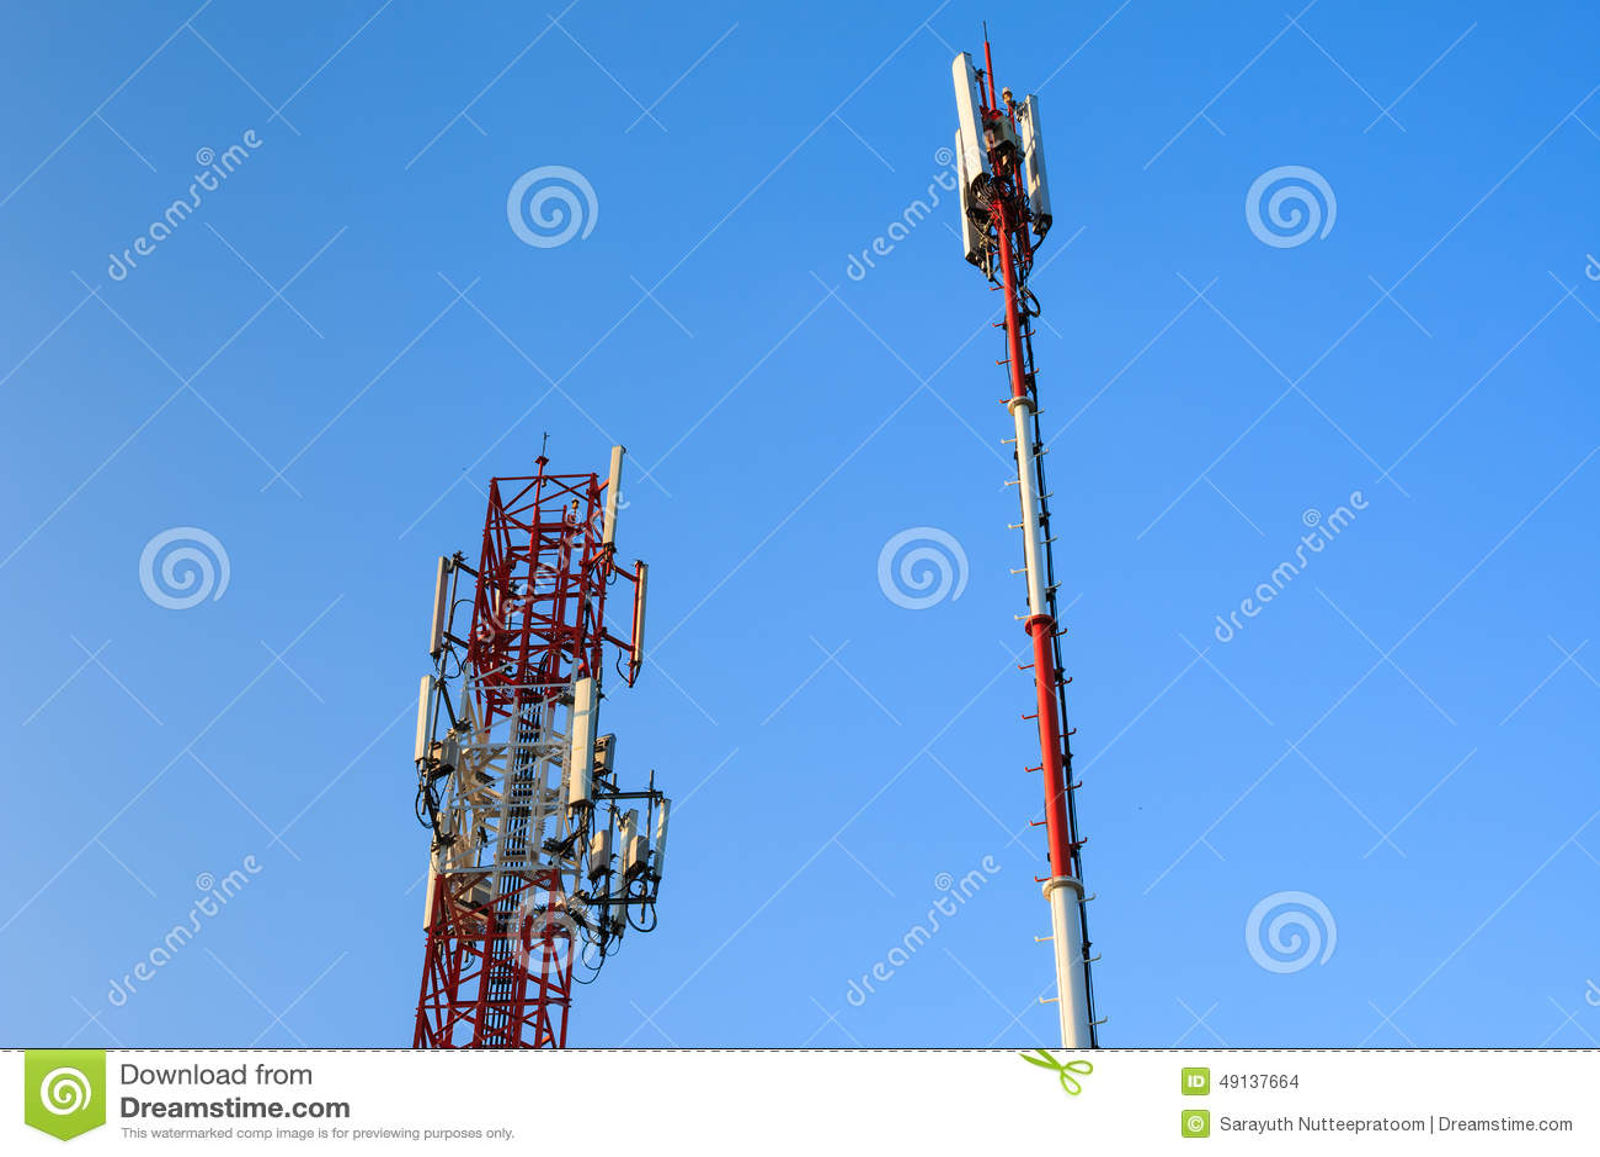 Radio communications towers